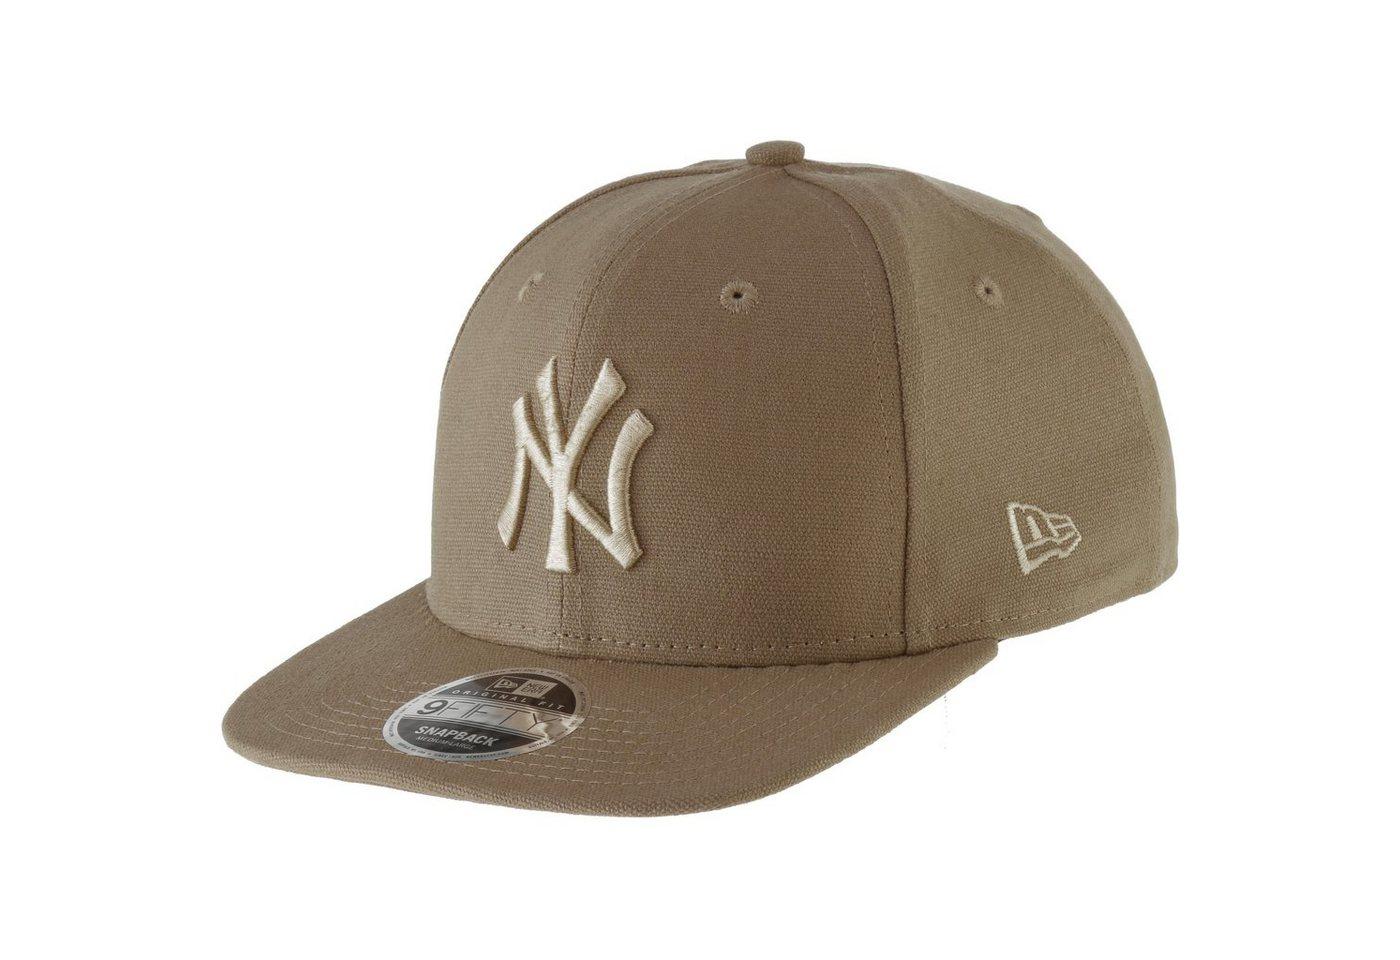 New Era Snapback Cap »9FIFTY NEW YORK YANKEES« | Accessoires > Caps > Snapback Caps | New Era